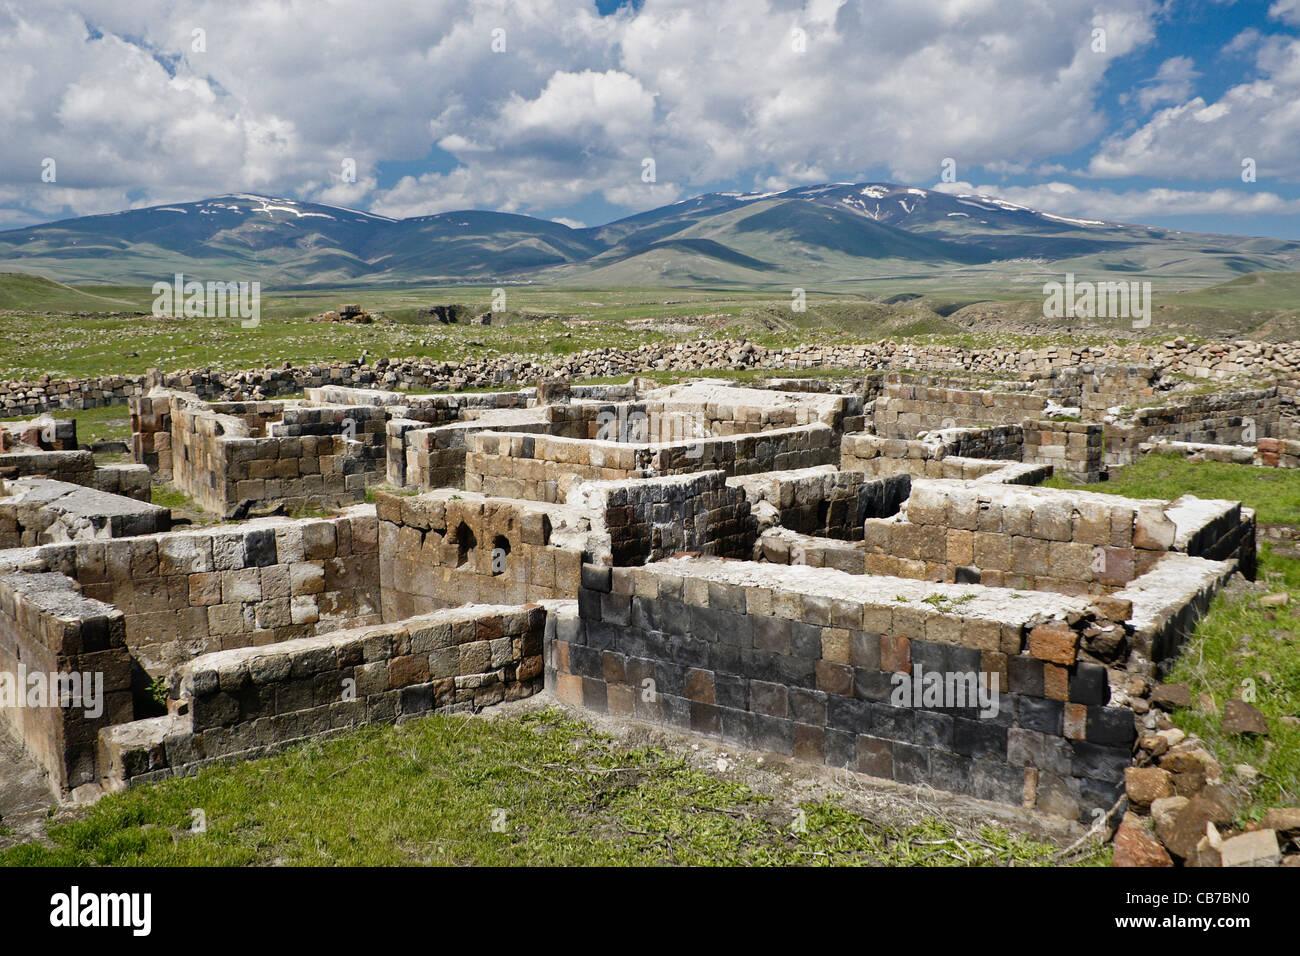 Ruins at Ani, Eastern Anatolia, Turkey Stock Photo